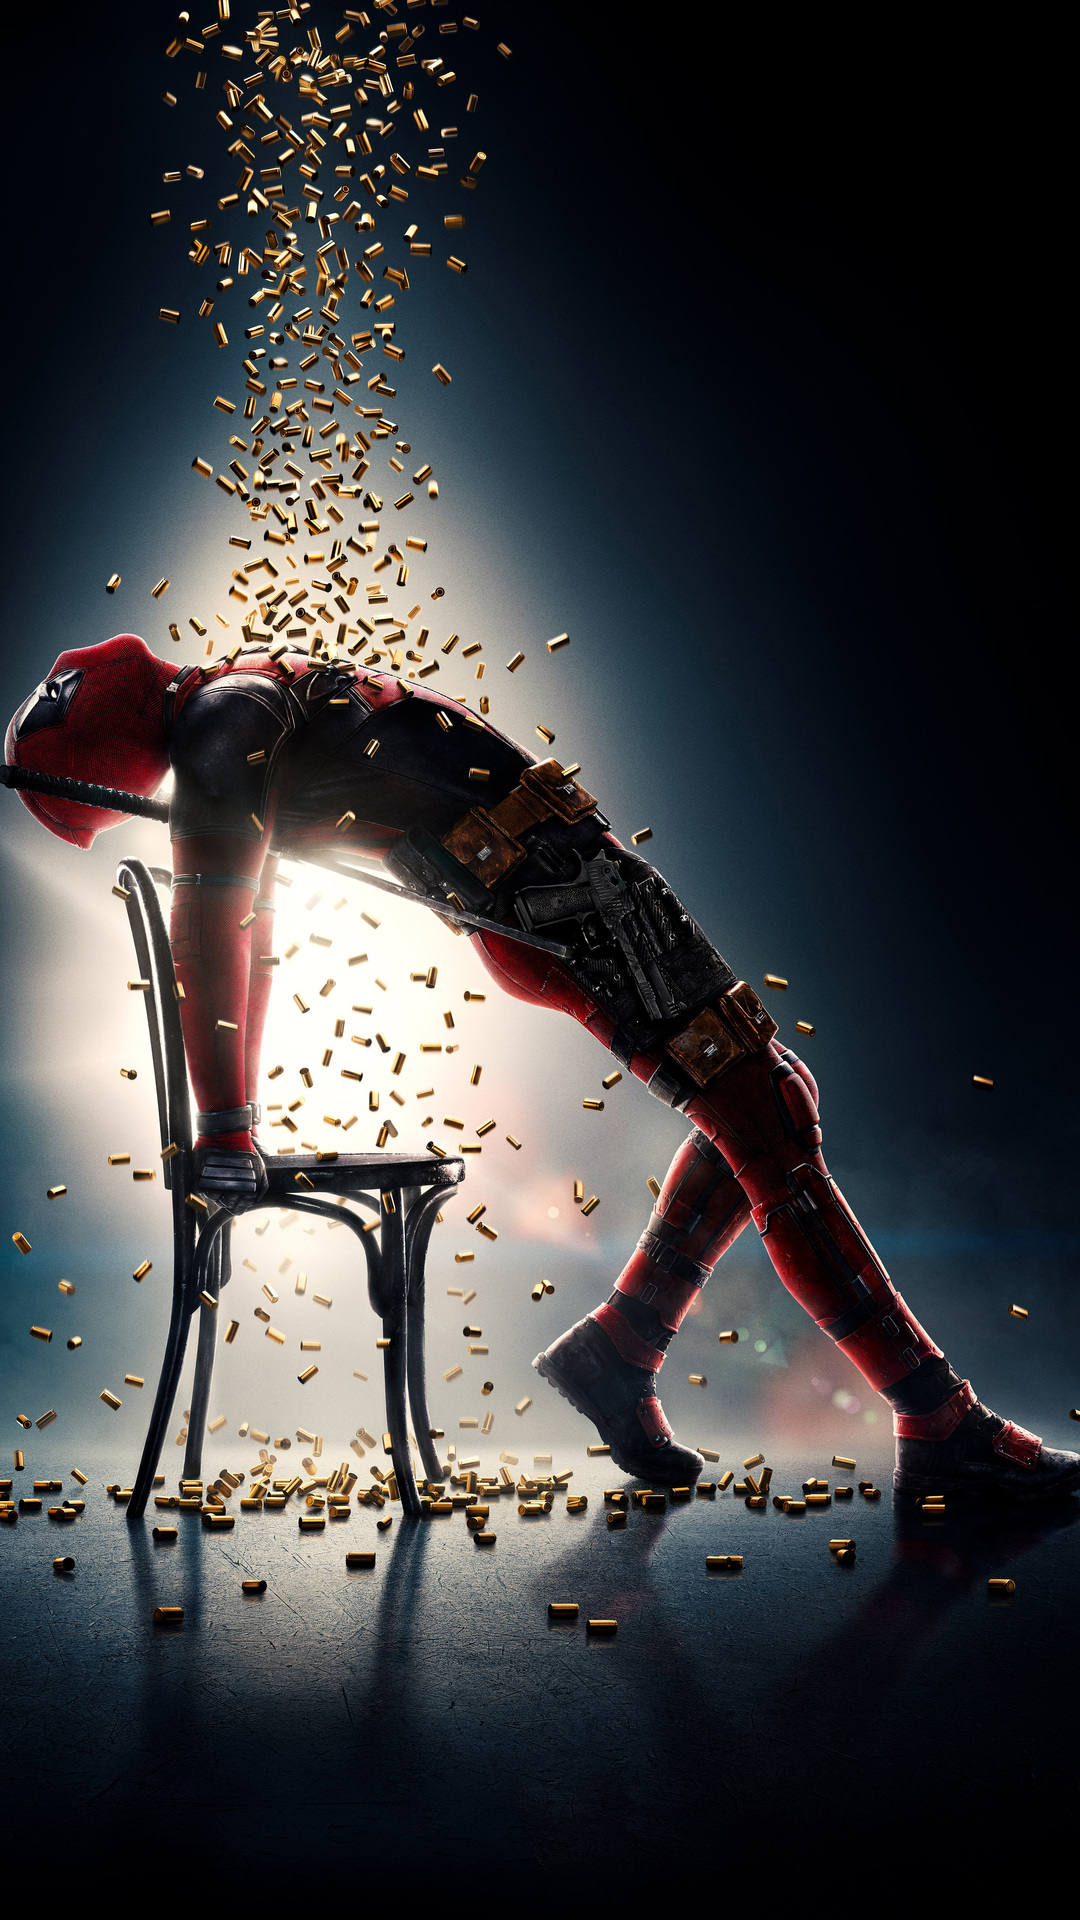 1080x1920 Deadpool 2 Movie Poster 4k Iphone 76s6 Plus Pixel Xl